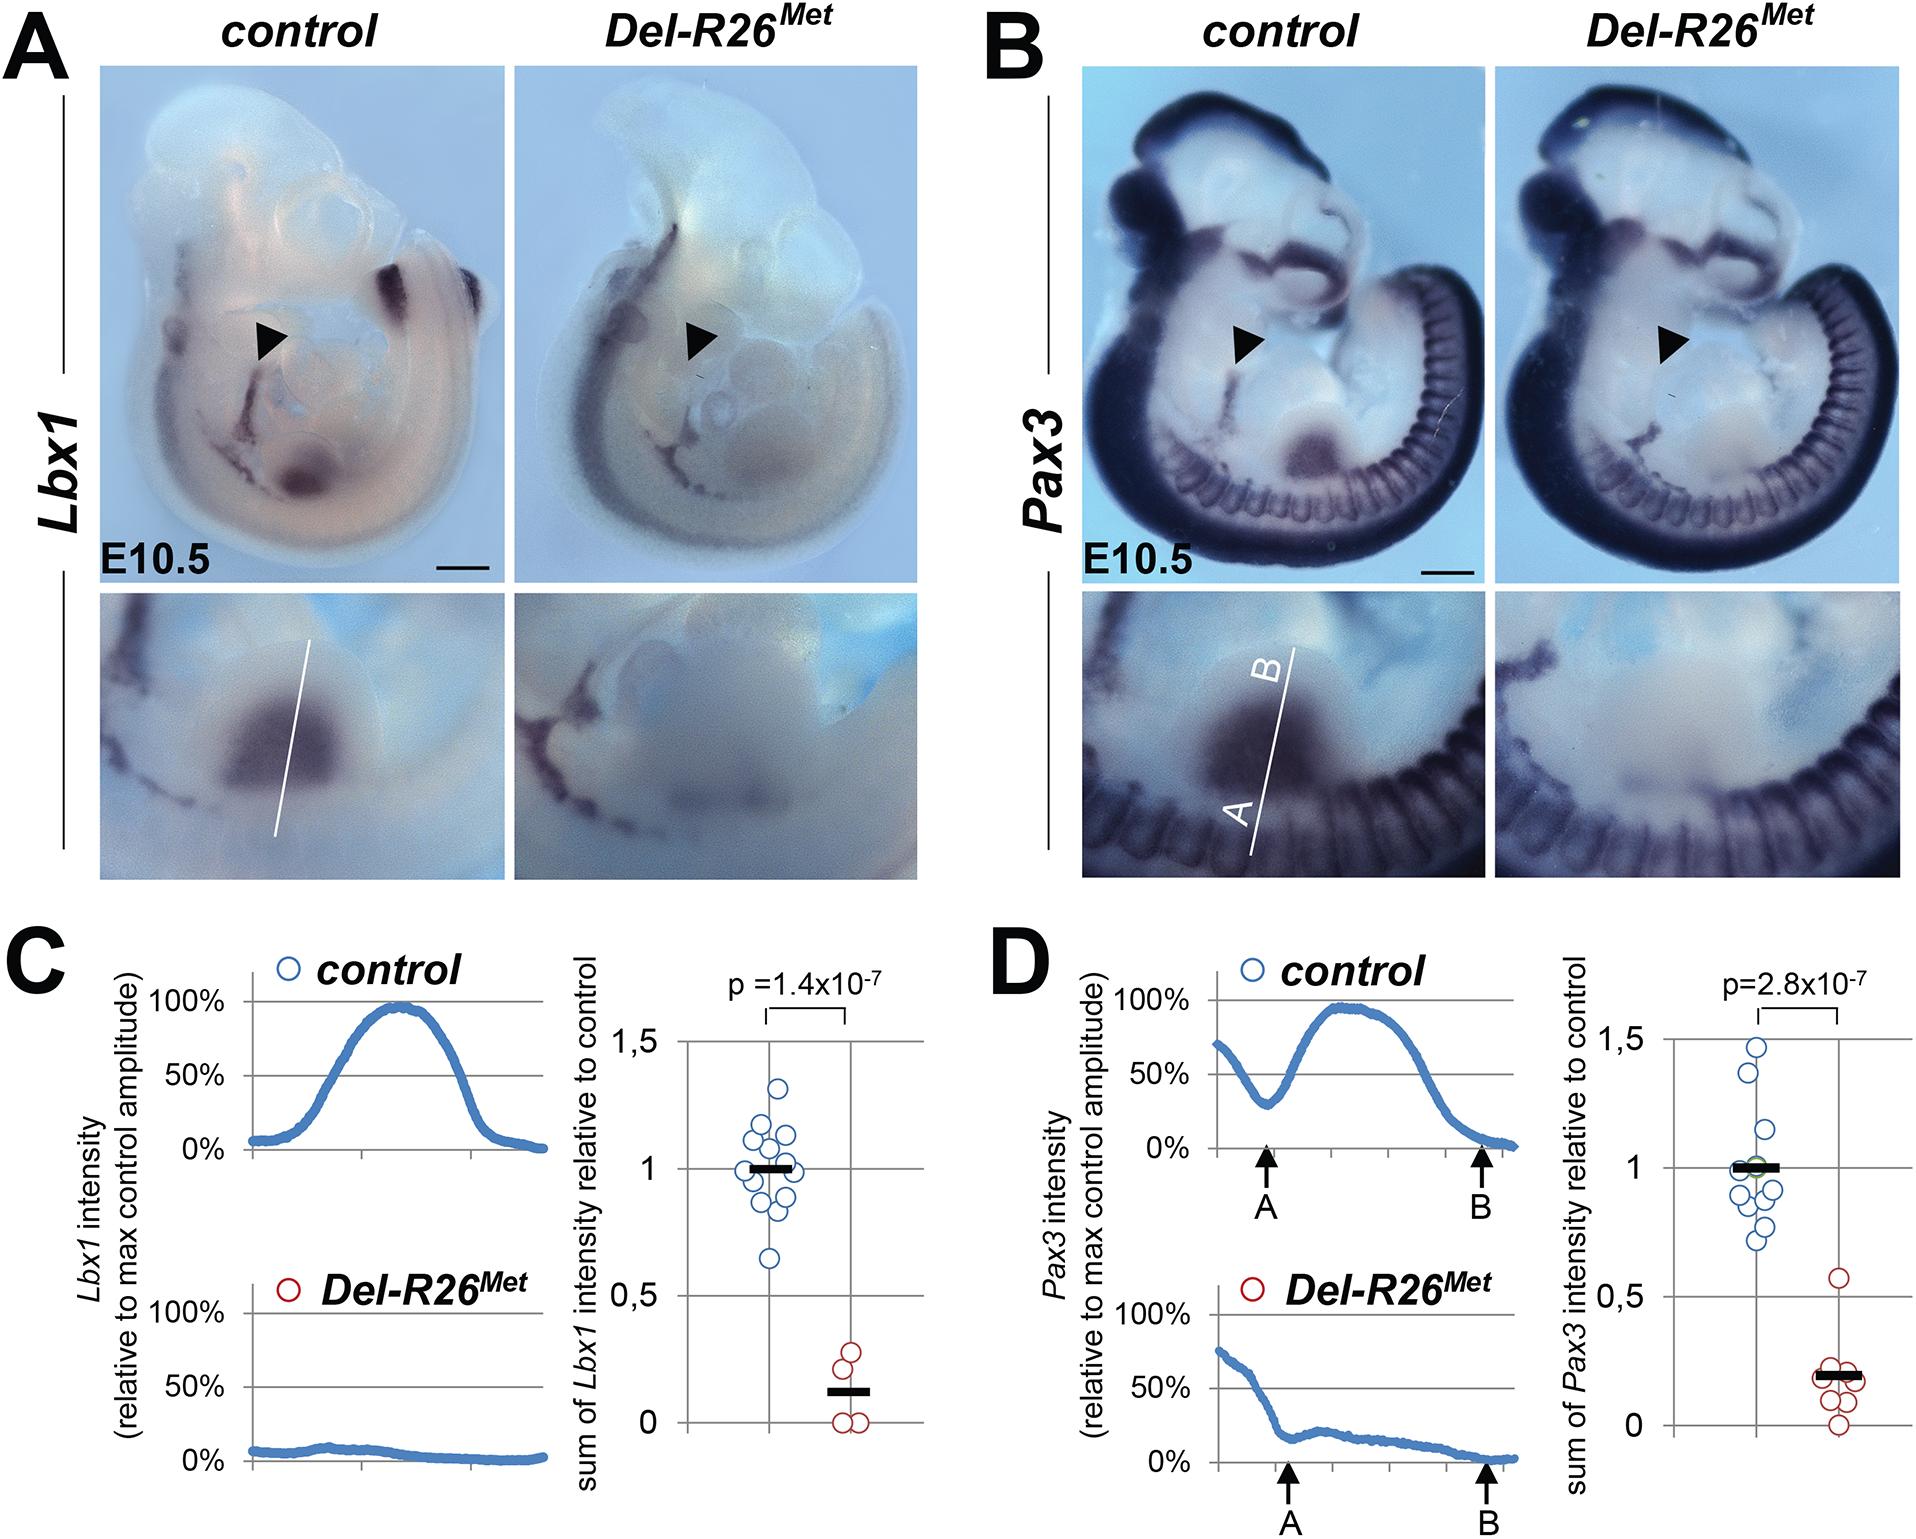 Myoblast migration is impaired in <i>Del-R26</i><sup><i>Met</i></sup> mutants.